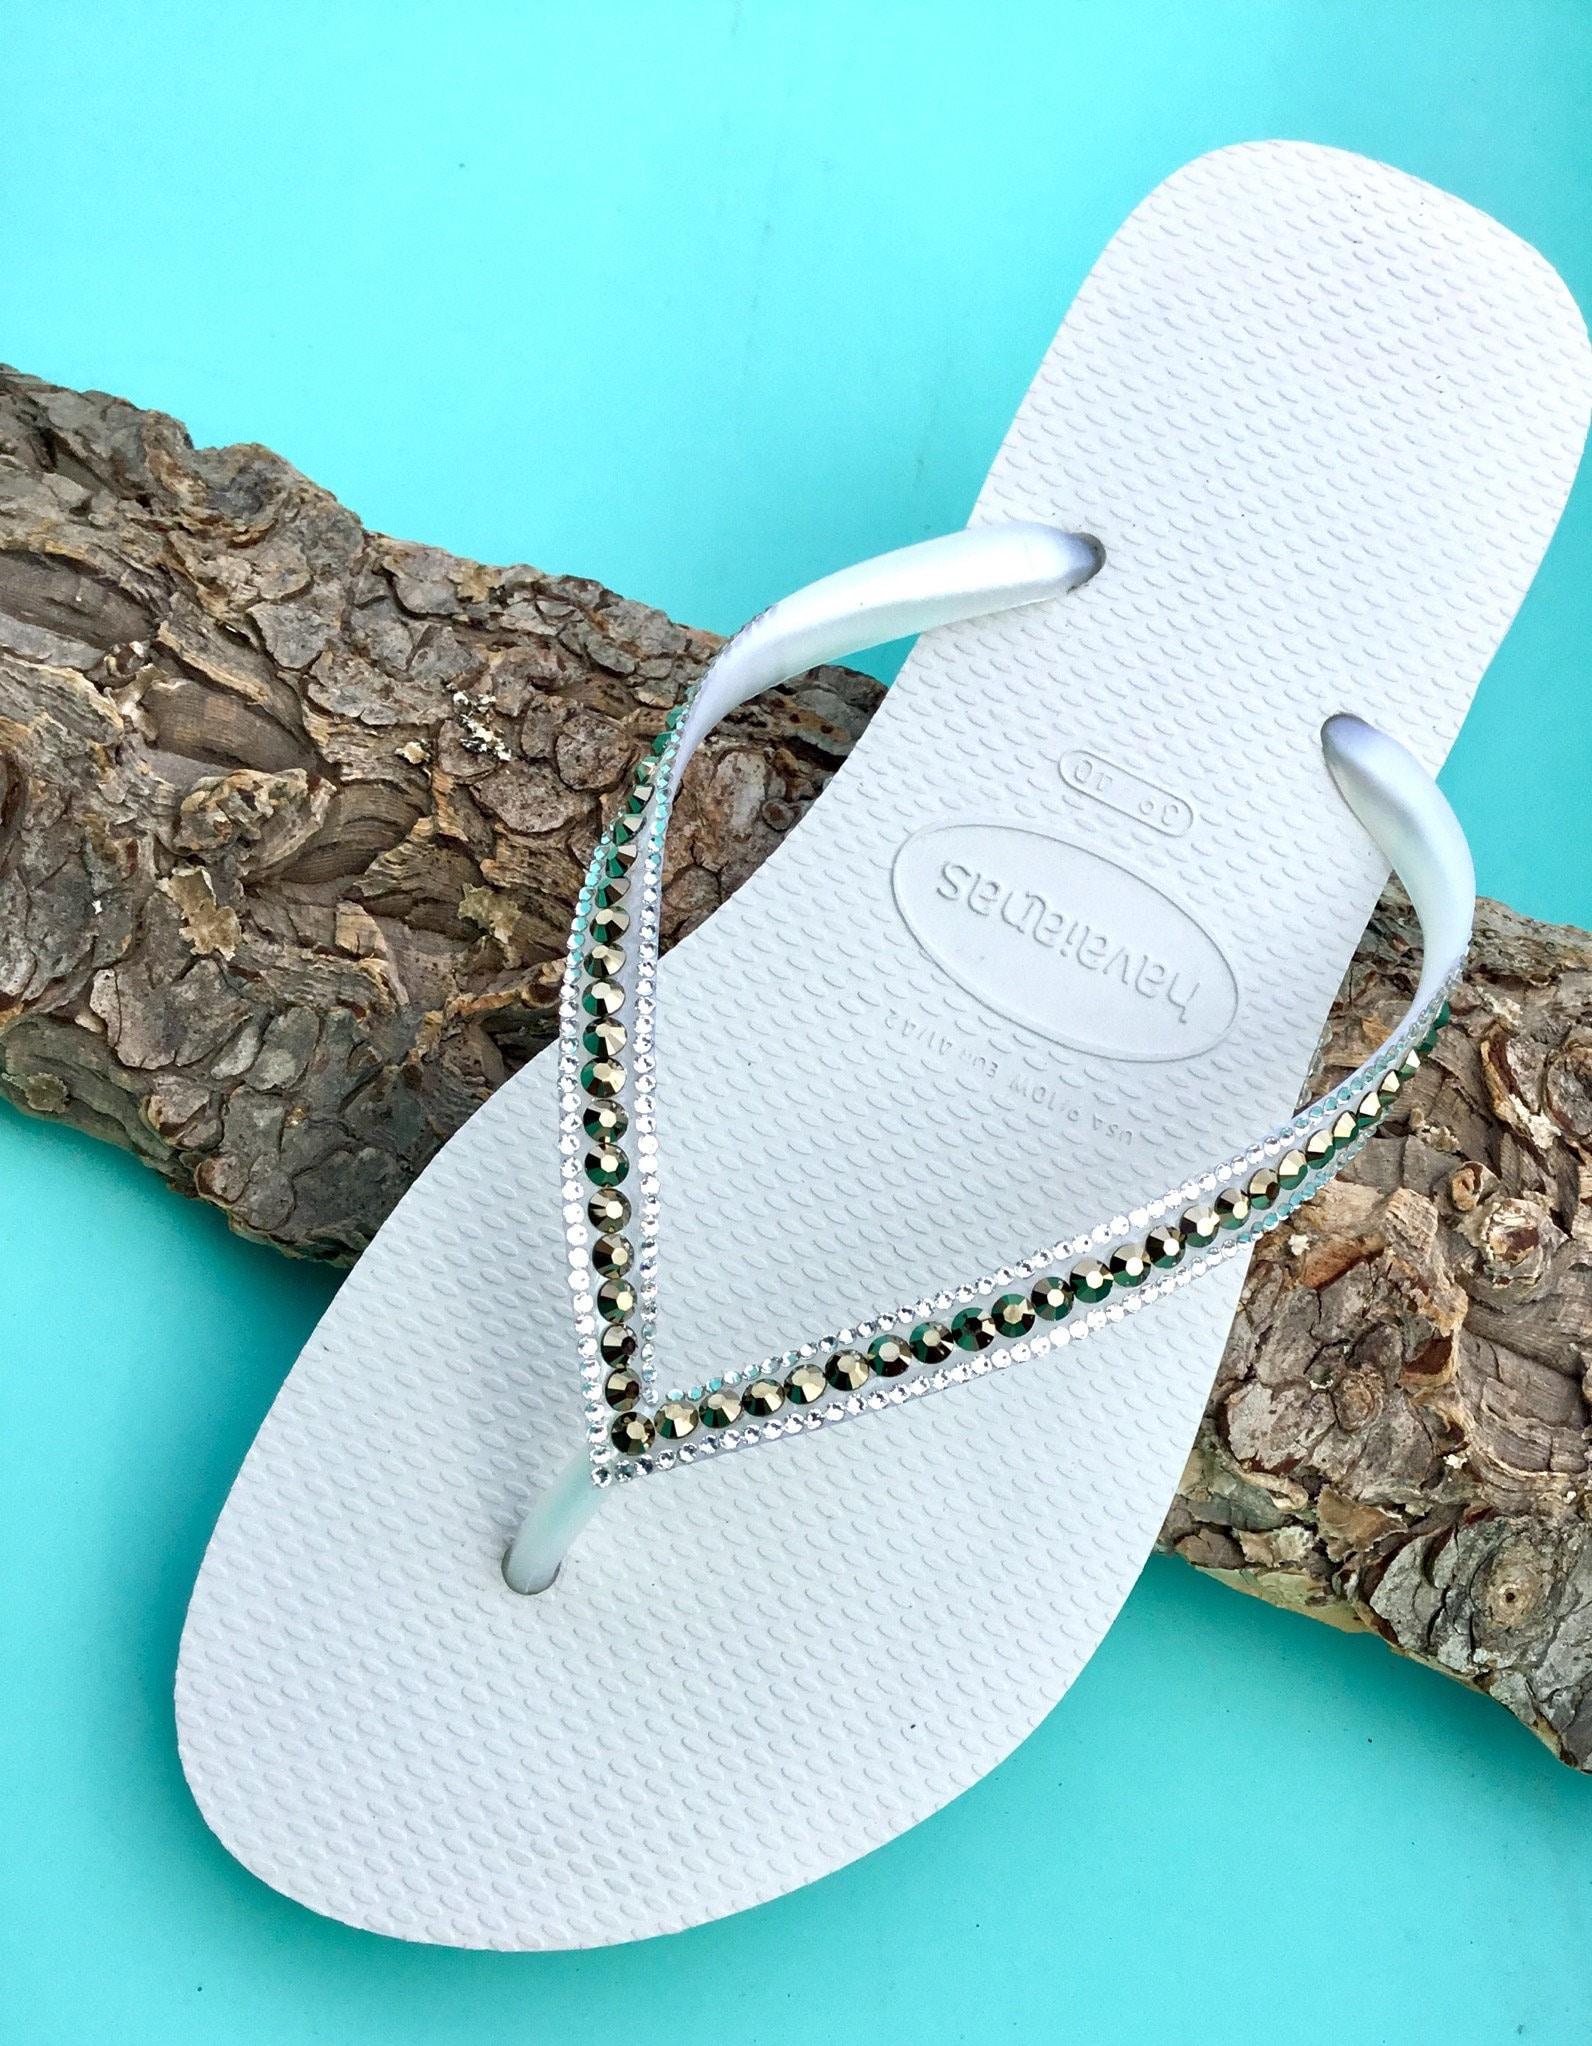 1970565e2 White Flip Flops Havaianas Slim Metallic Light Gold Ore w  Swarovski  Rhinestone Jewels Beach Wedding Bridal Bridesmaid Bling Slippers Shoes